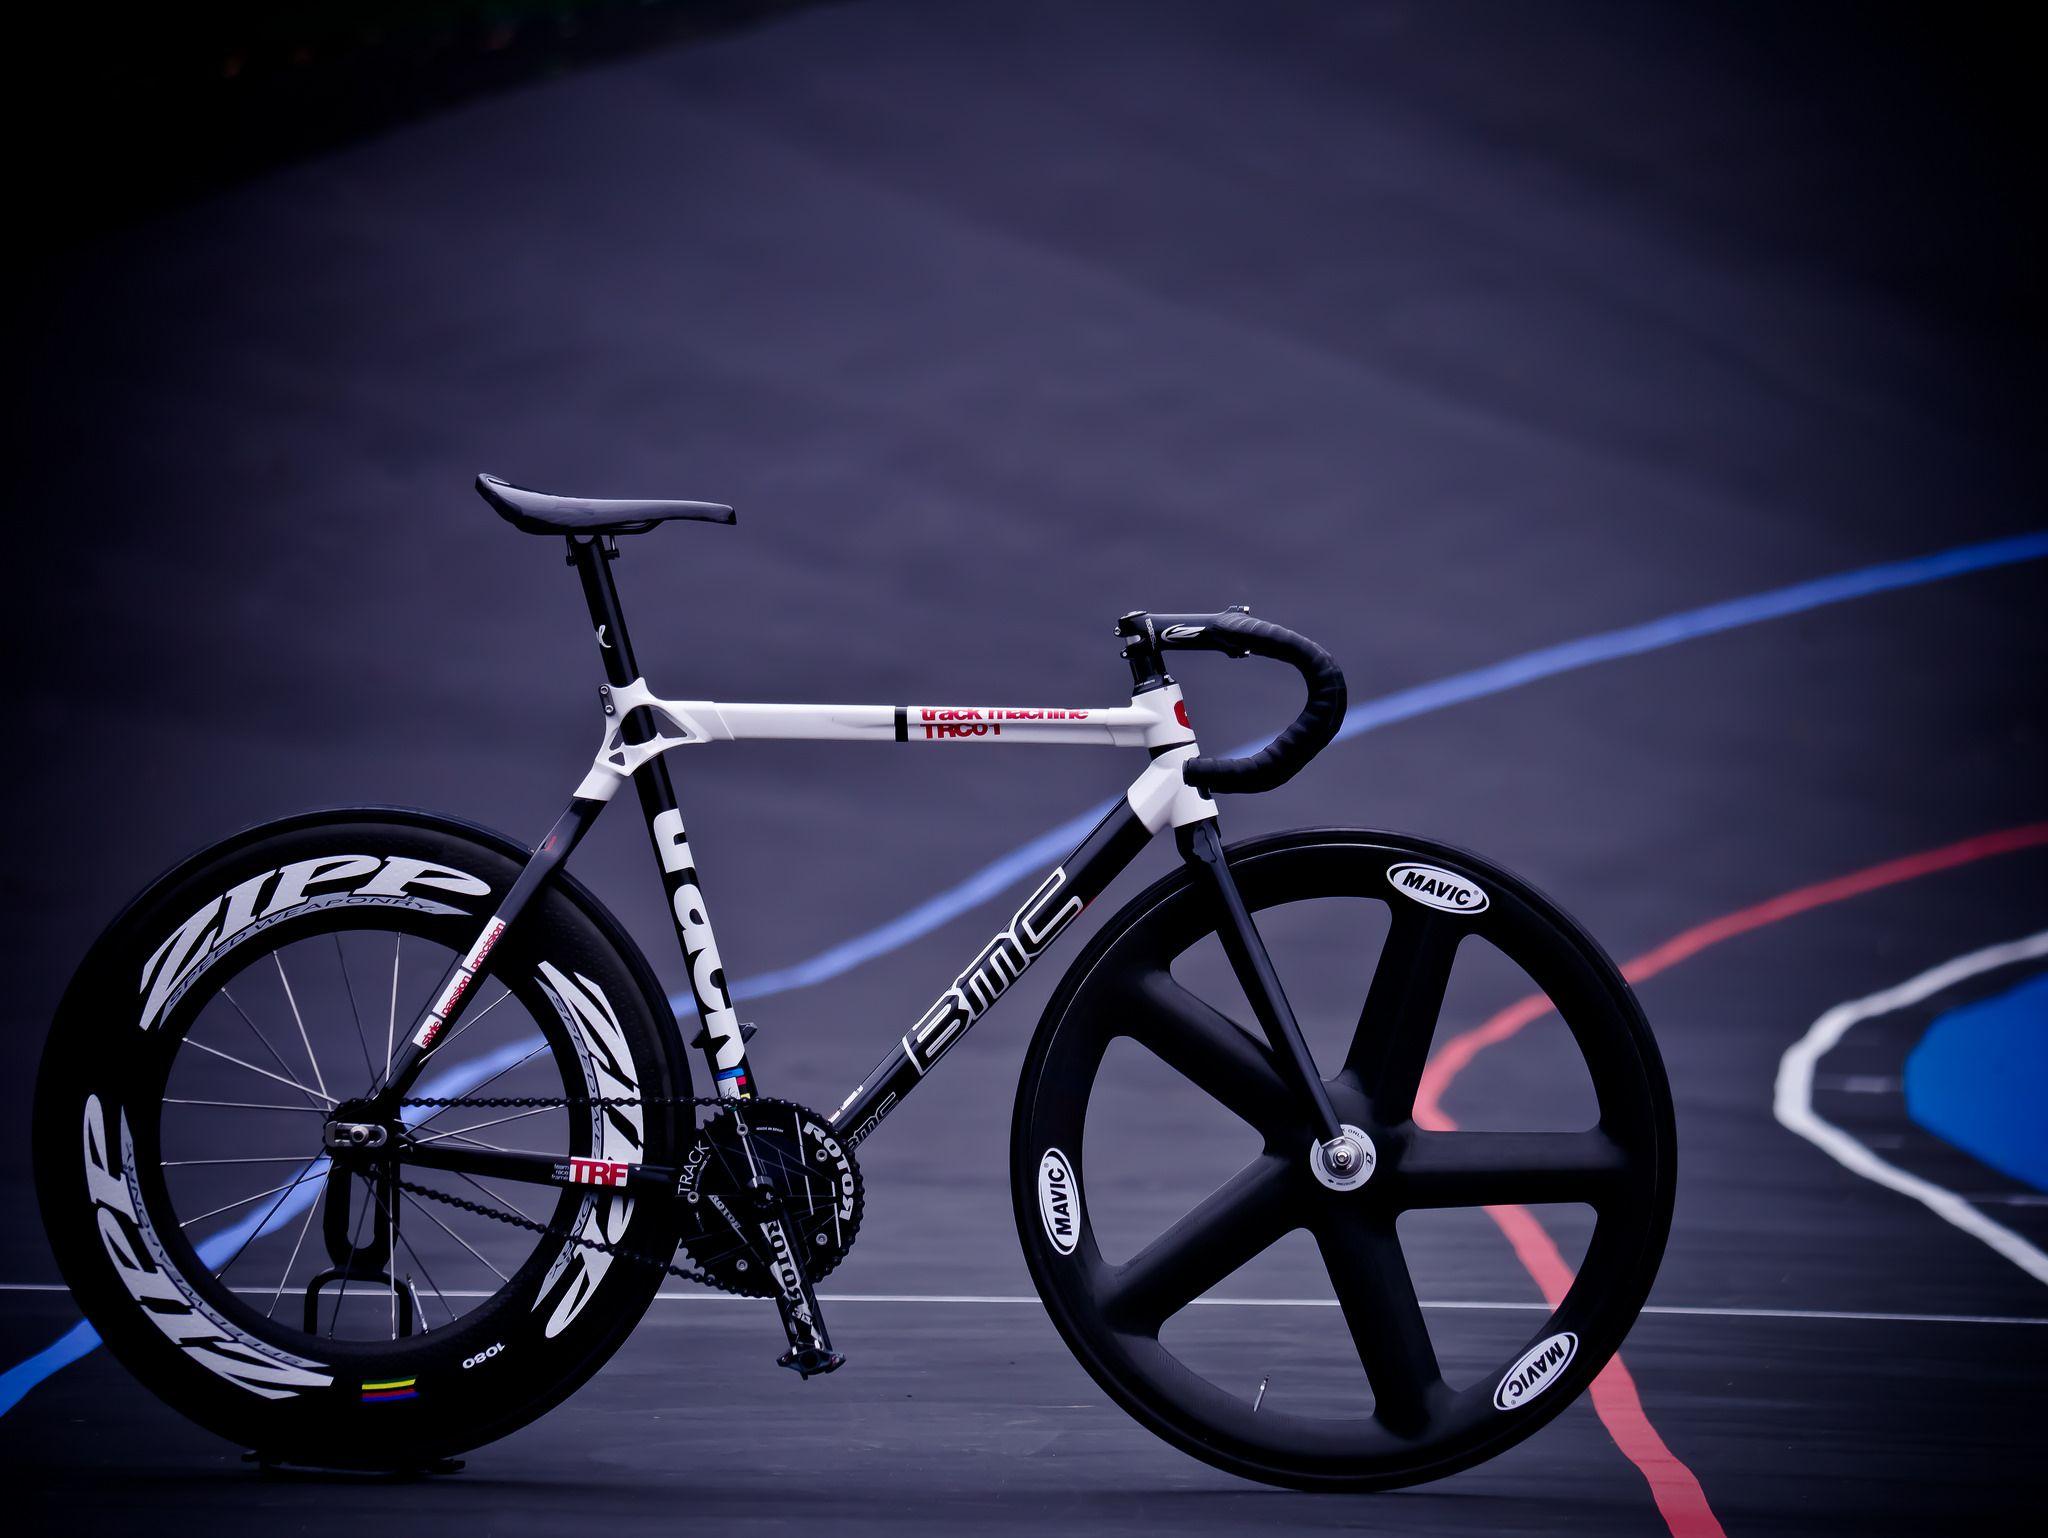 Bmc Track Taiwan Velodrome Bicycle Speed Bike Bike With